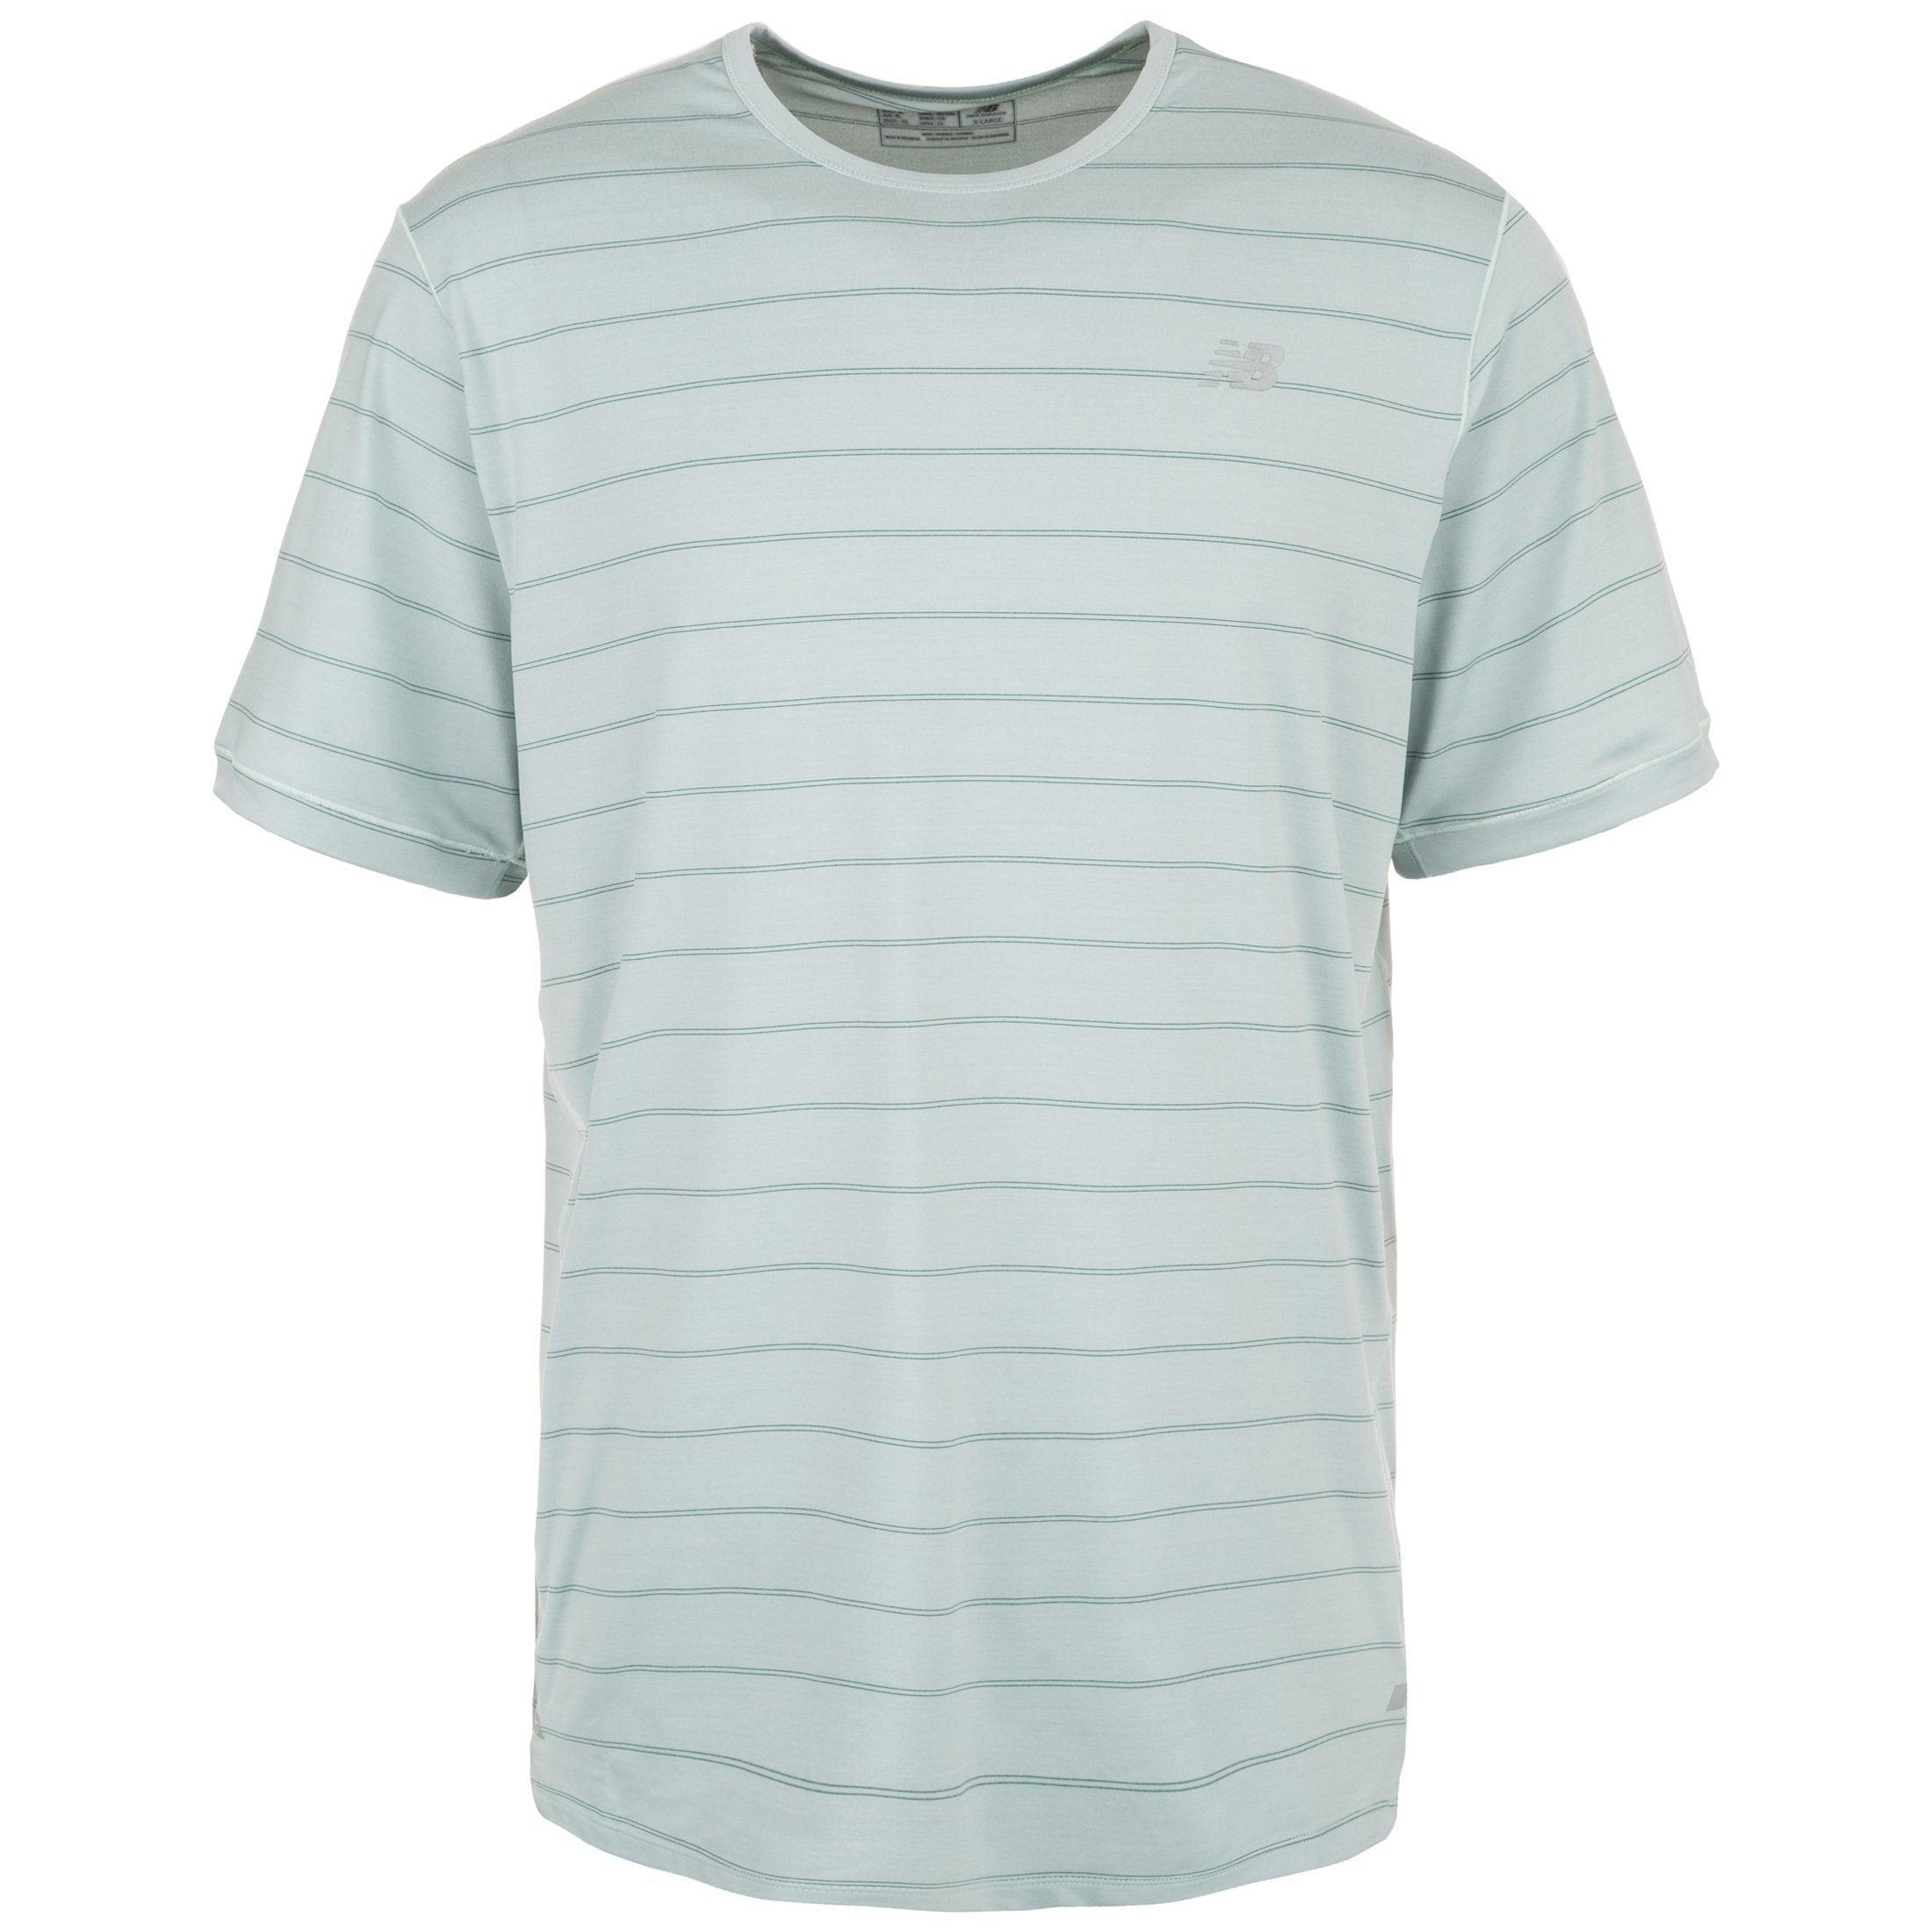 New Balance Laufshirt Seasonless | Sportbekleidung > Sportshirts | Grün | Ab | New Balance